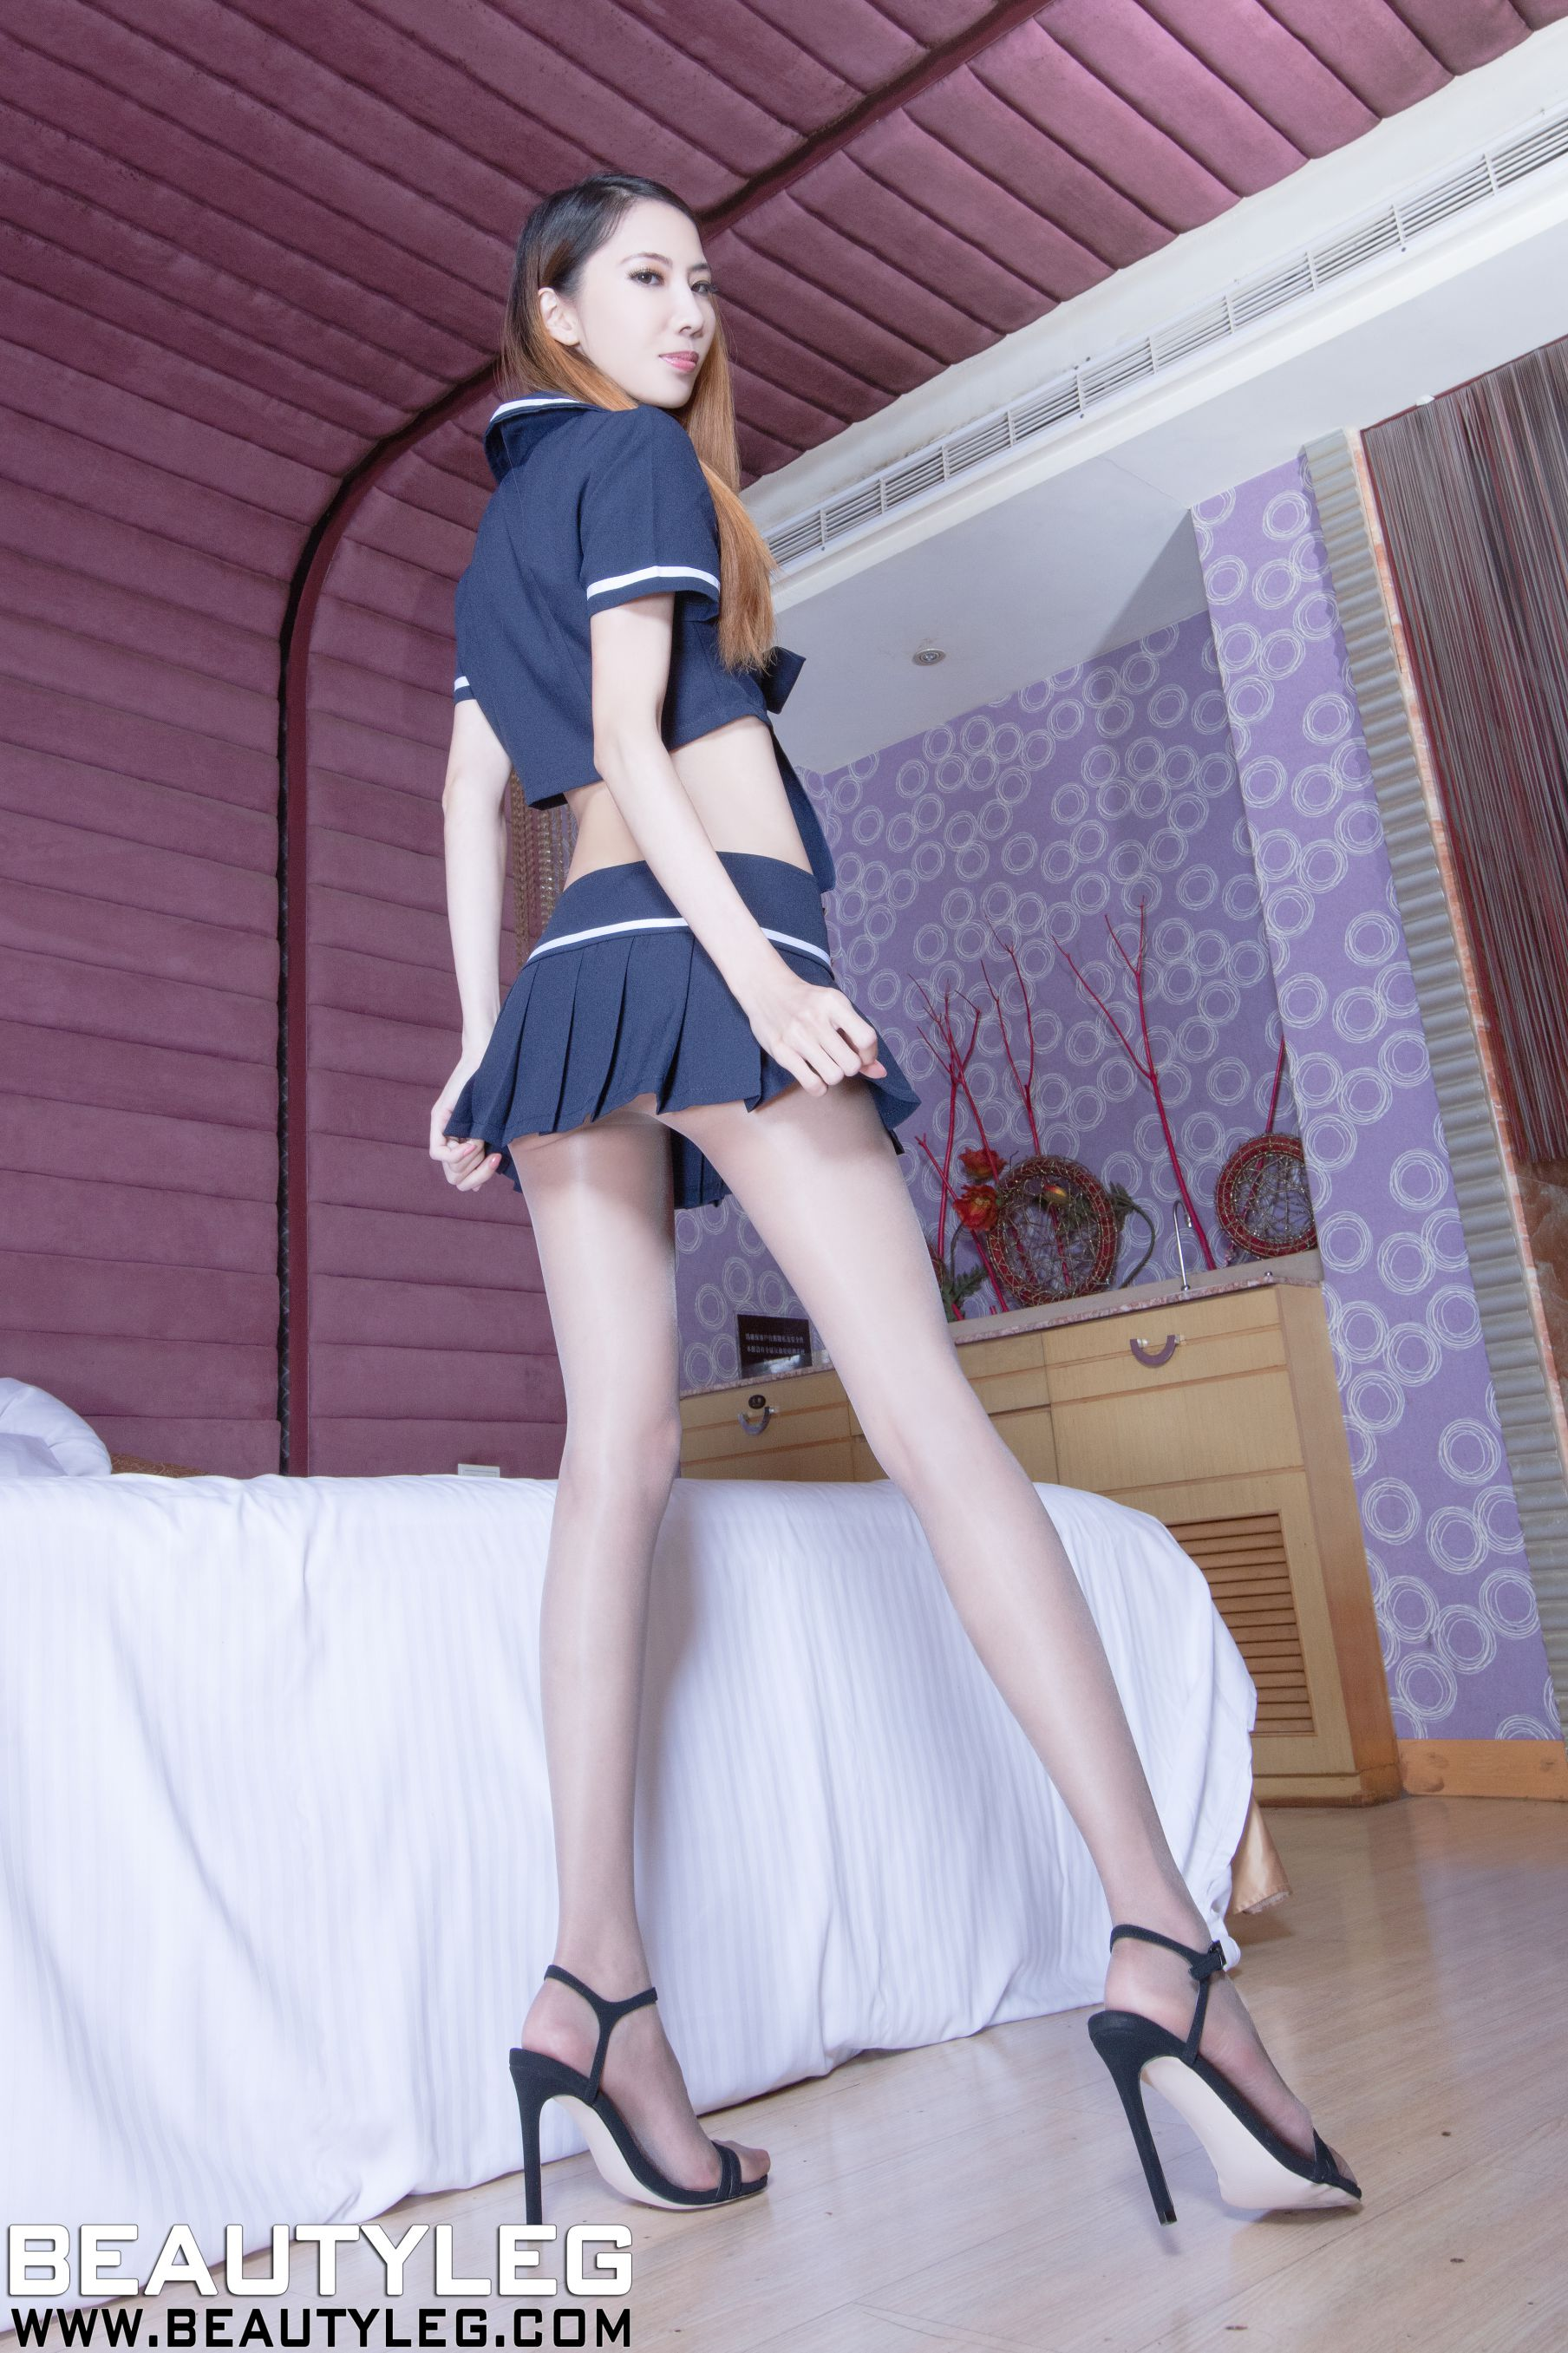 VOL.45 [Beautyleg]高跟美腿:童采萱(Beautyleg Yoyo,腿模Yoyo)高品质写真套图(43P)